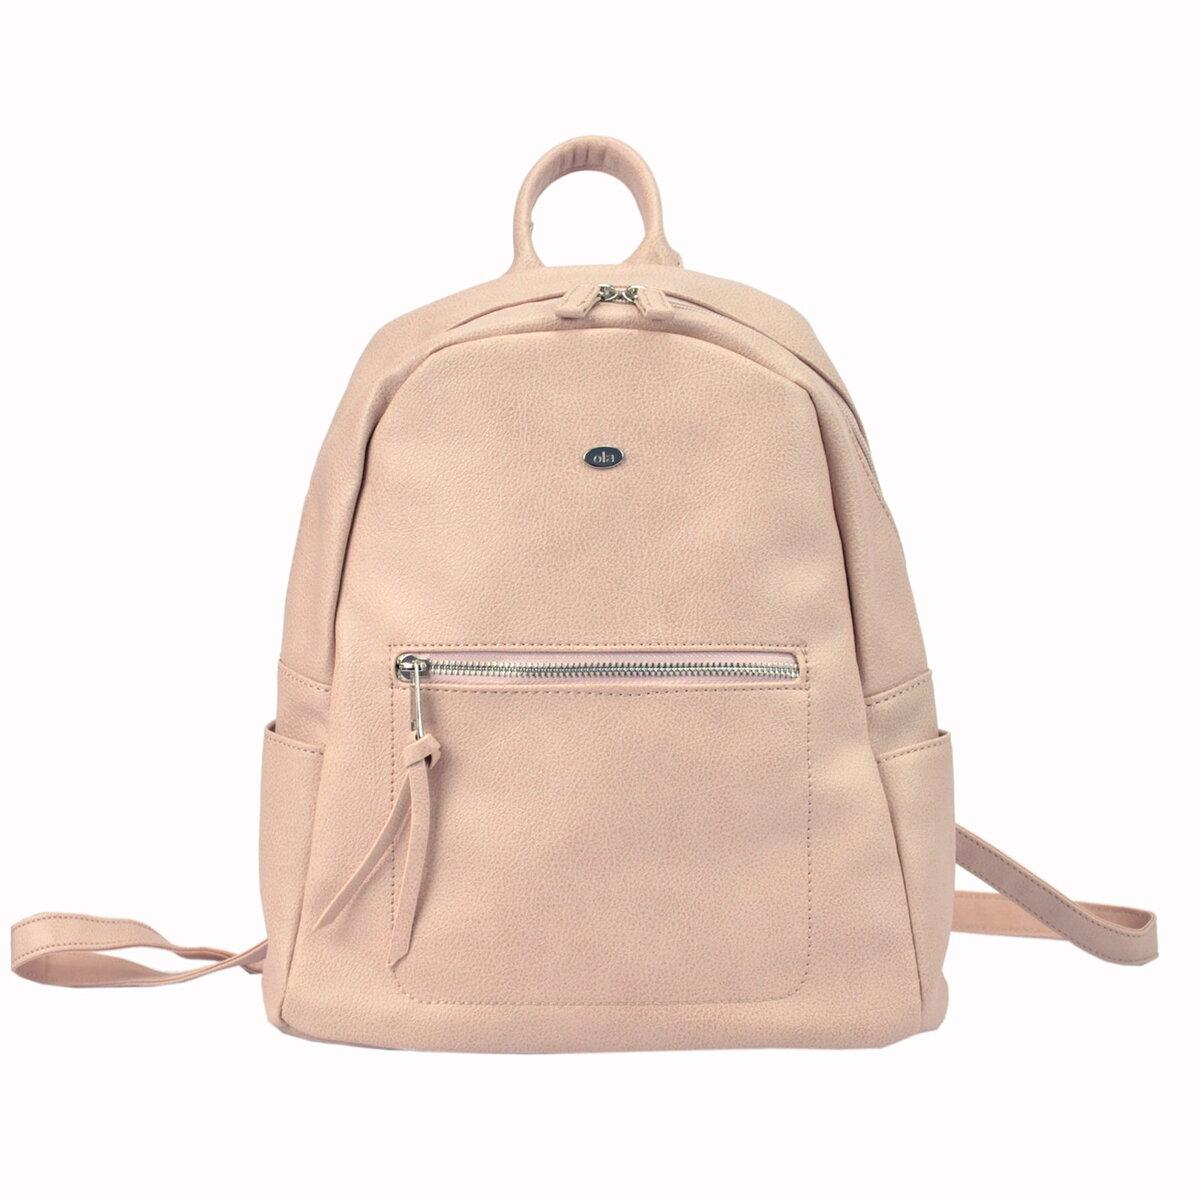 4e7b3237c Čierny ruksak David Jones OLA SSG9104 Ružový ruksak David Jones OLA SSG9104